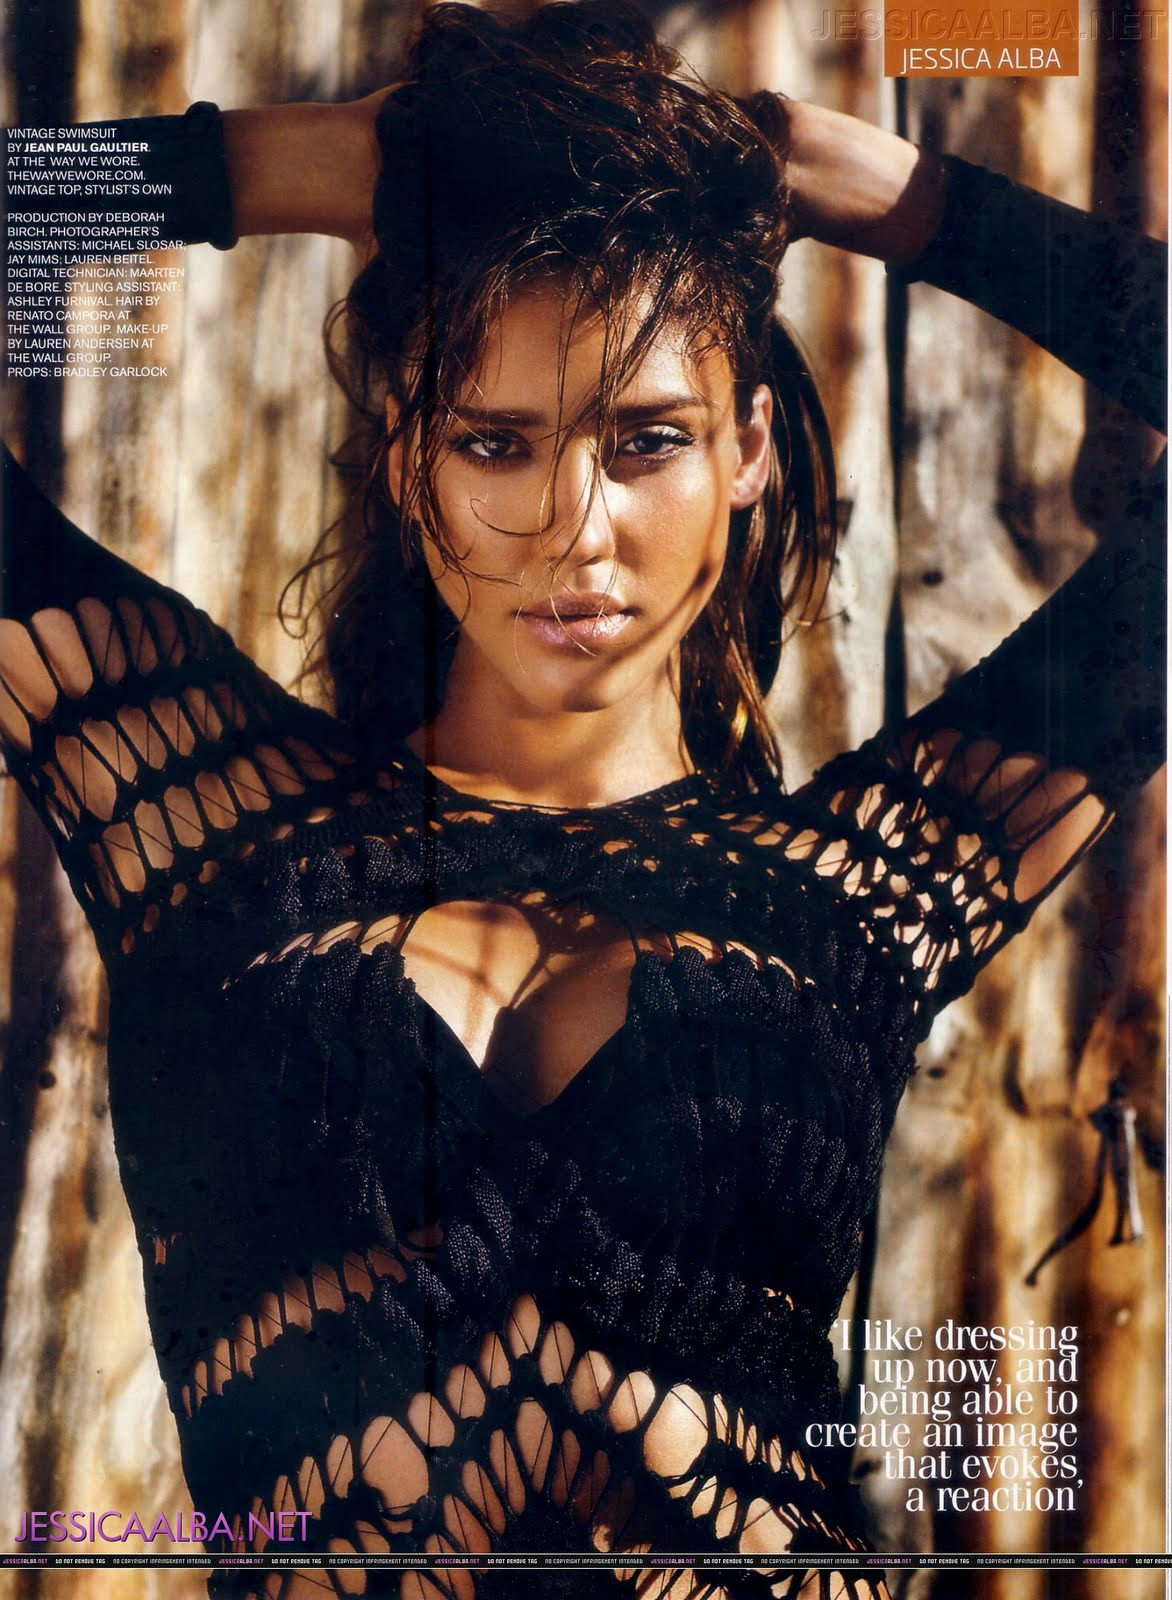 http://1.bp.blogspot.com/_rPuhgiGm-xw/TLdLMKfXPuI/AAAAAAAAB1U/CV9aNiAnxTU/s1600/Jessica-Alba-.jpg